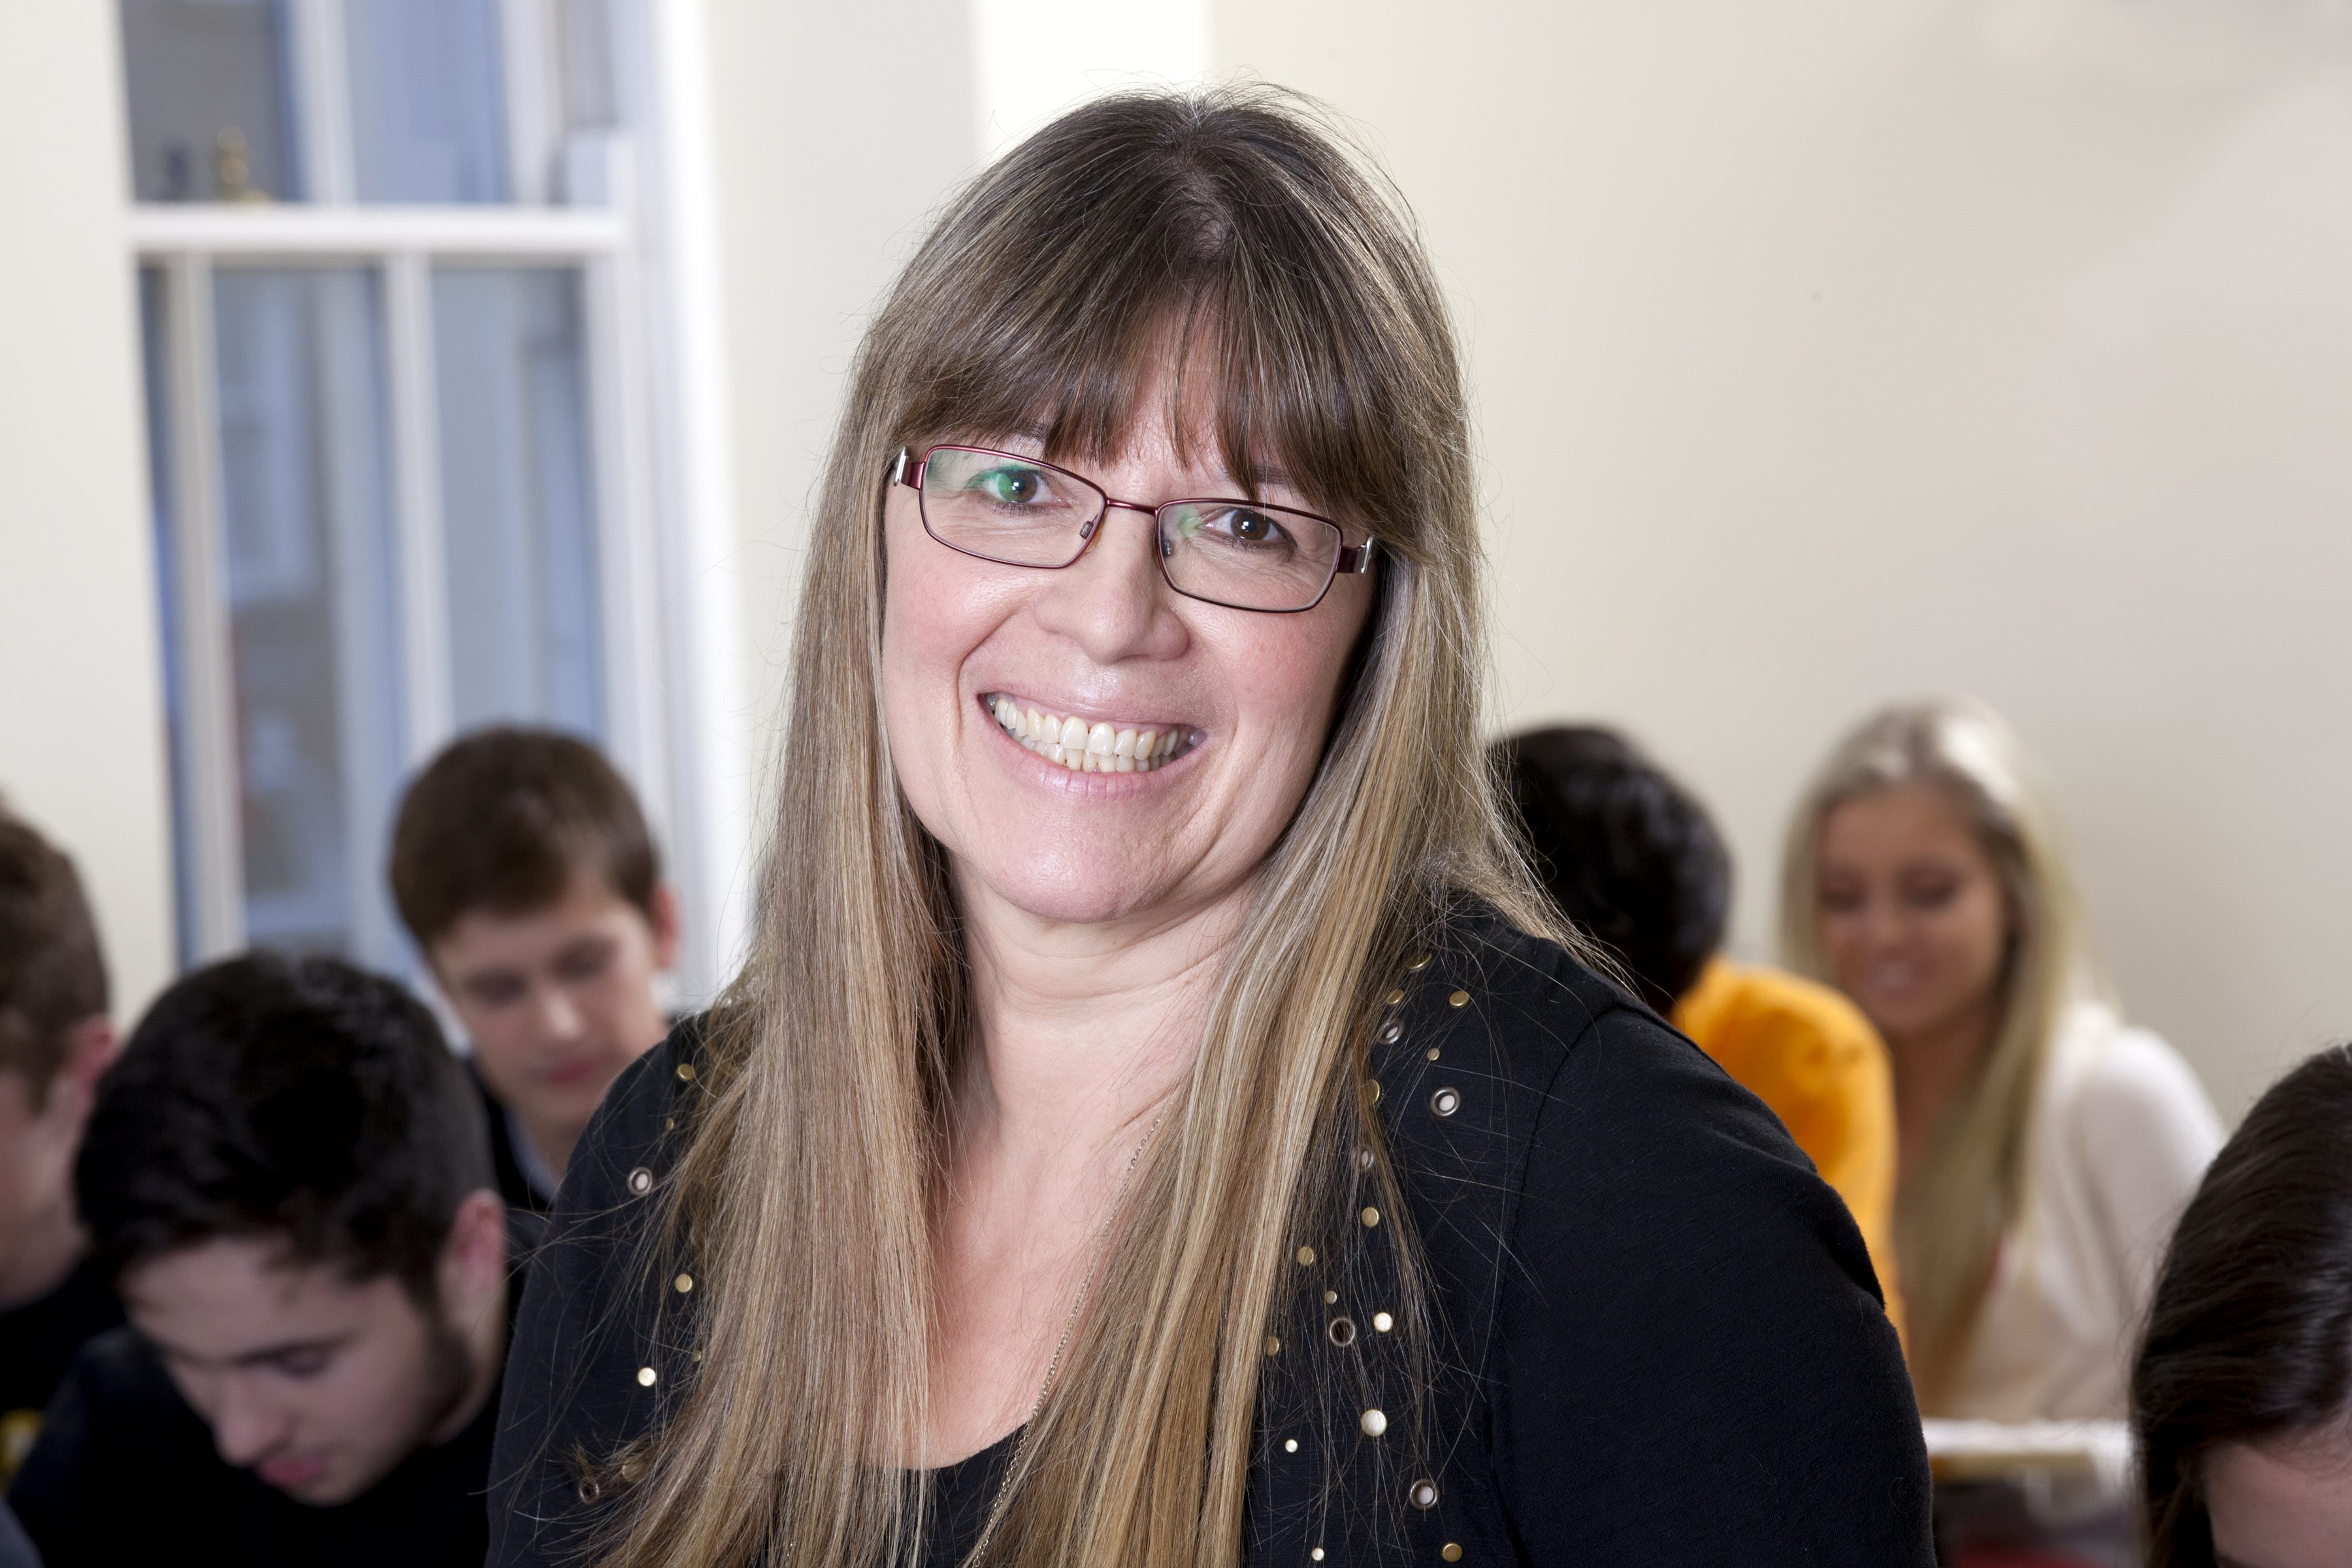 Corinne Gavenda - French Teacher at The Institute of Education